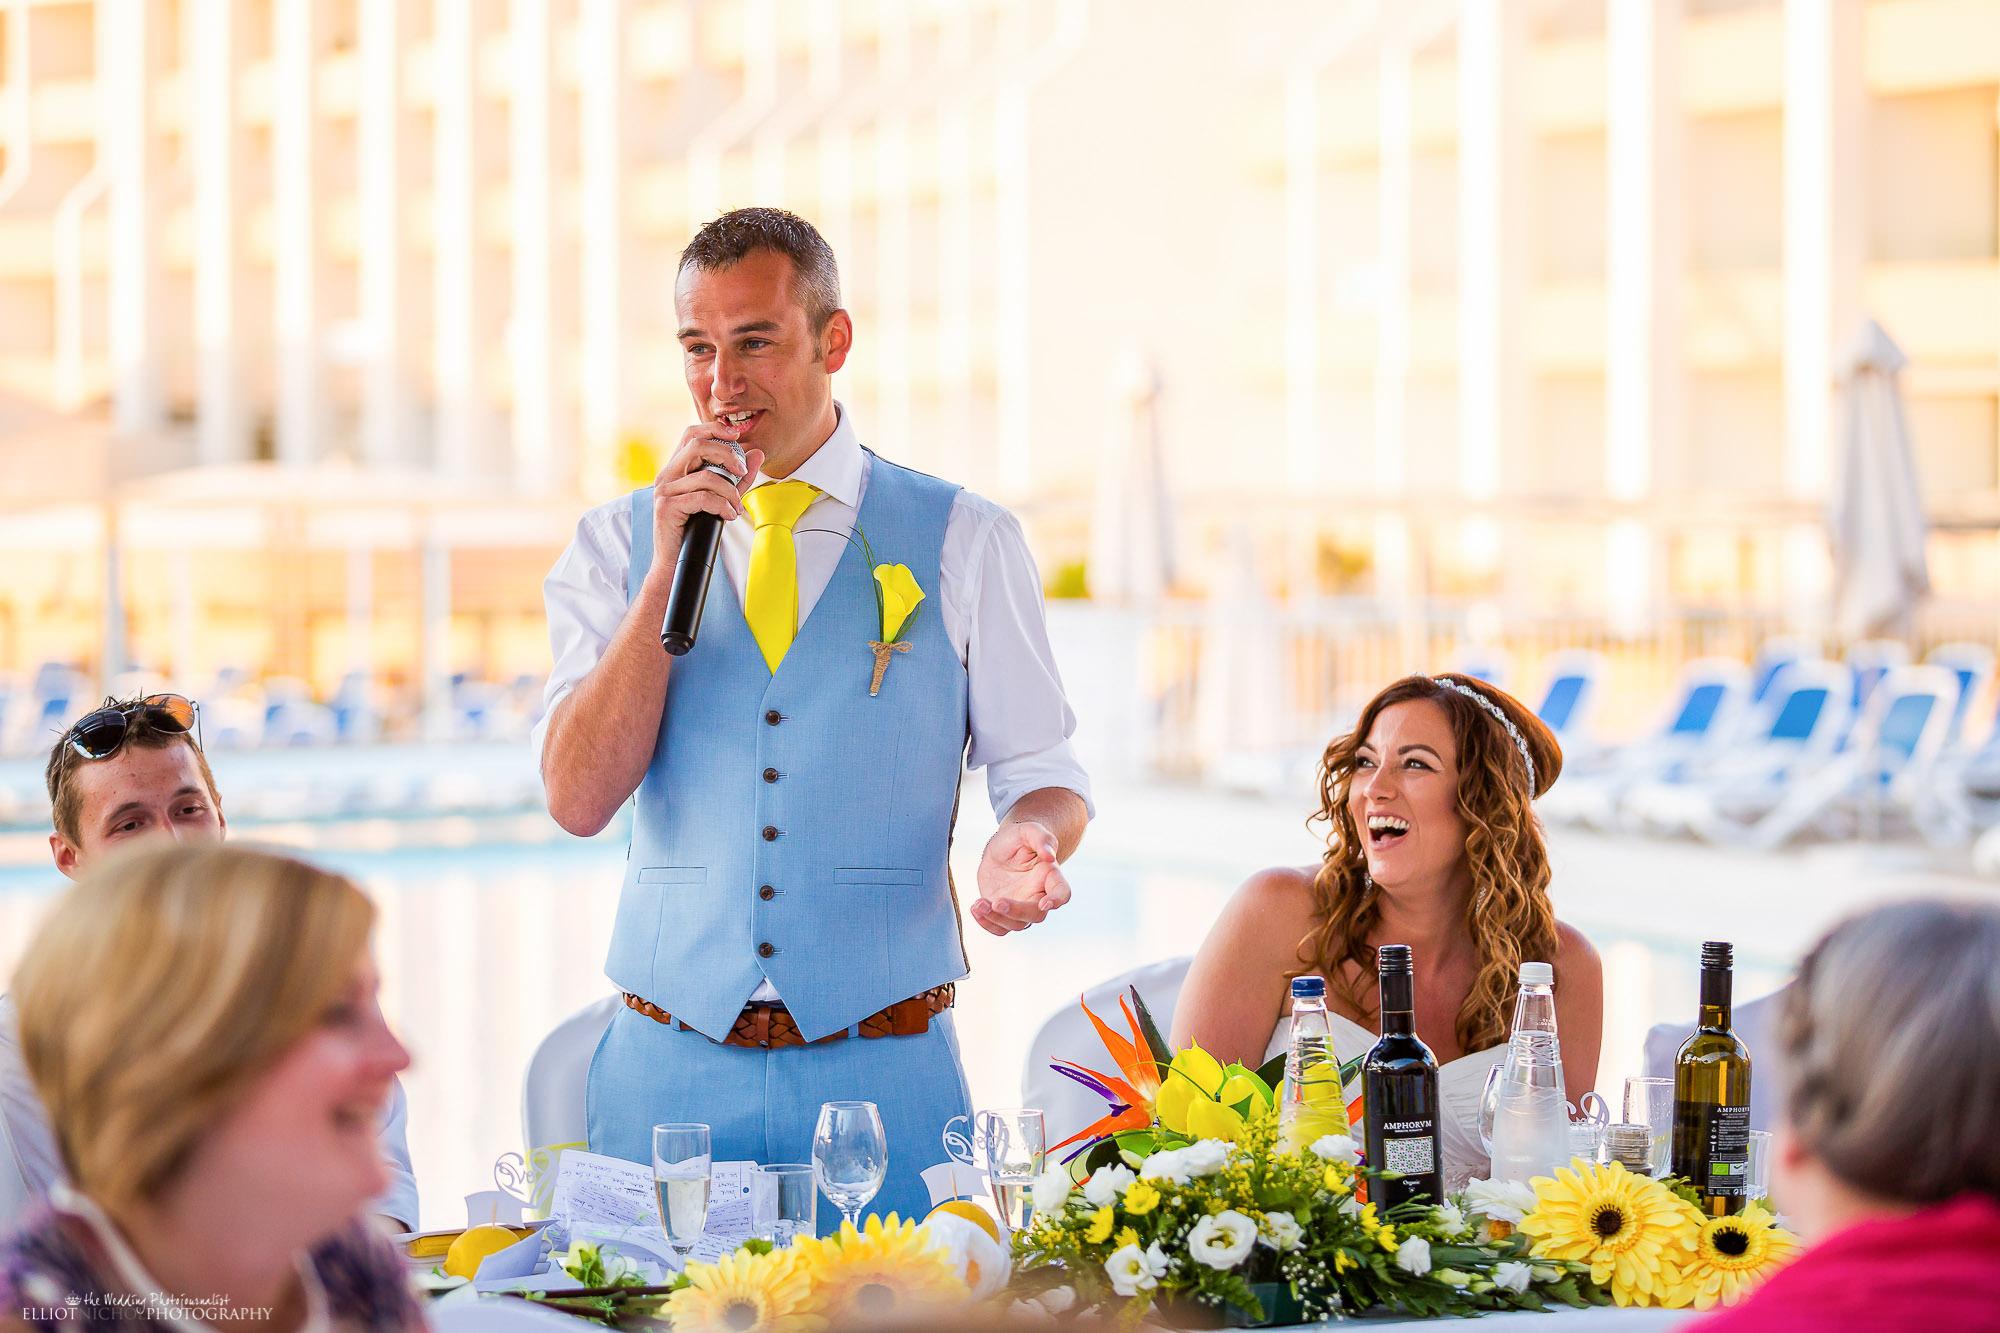 bride-groom-speech-speeches-wedding-reception-photography